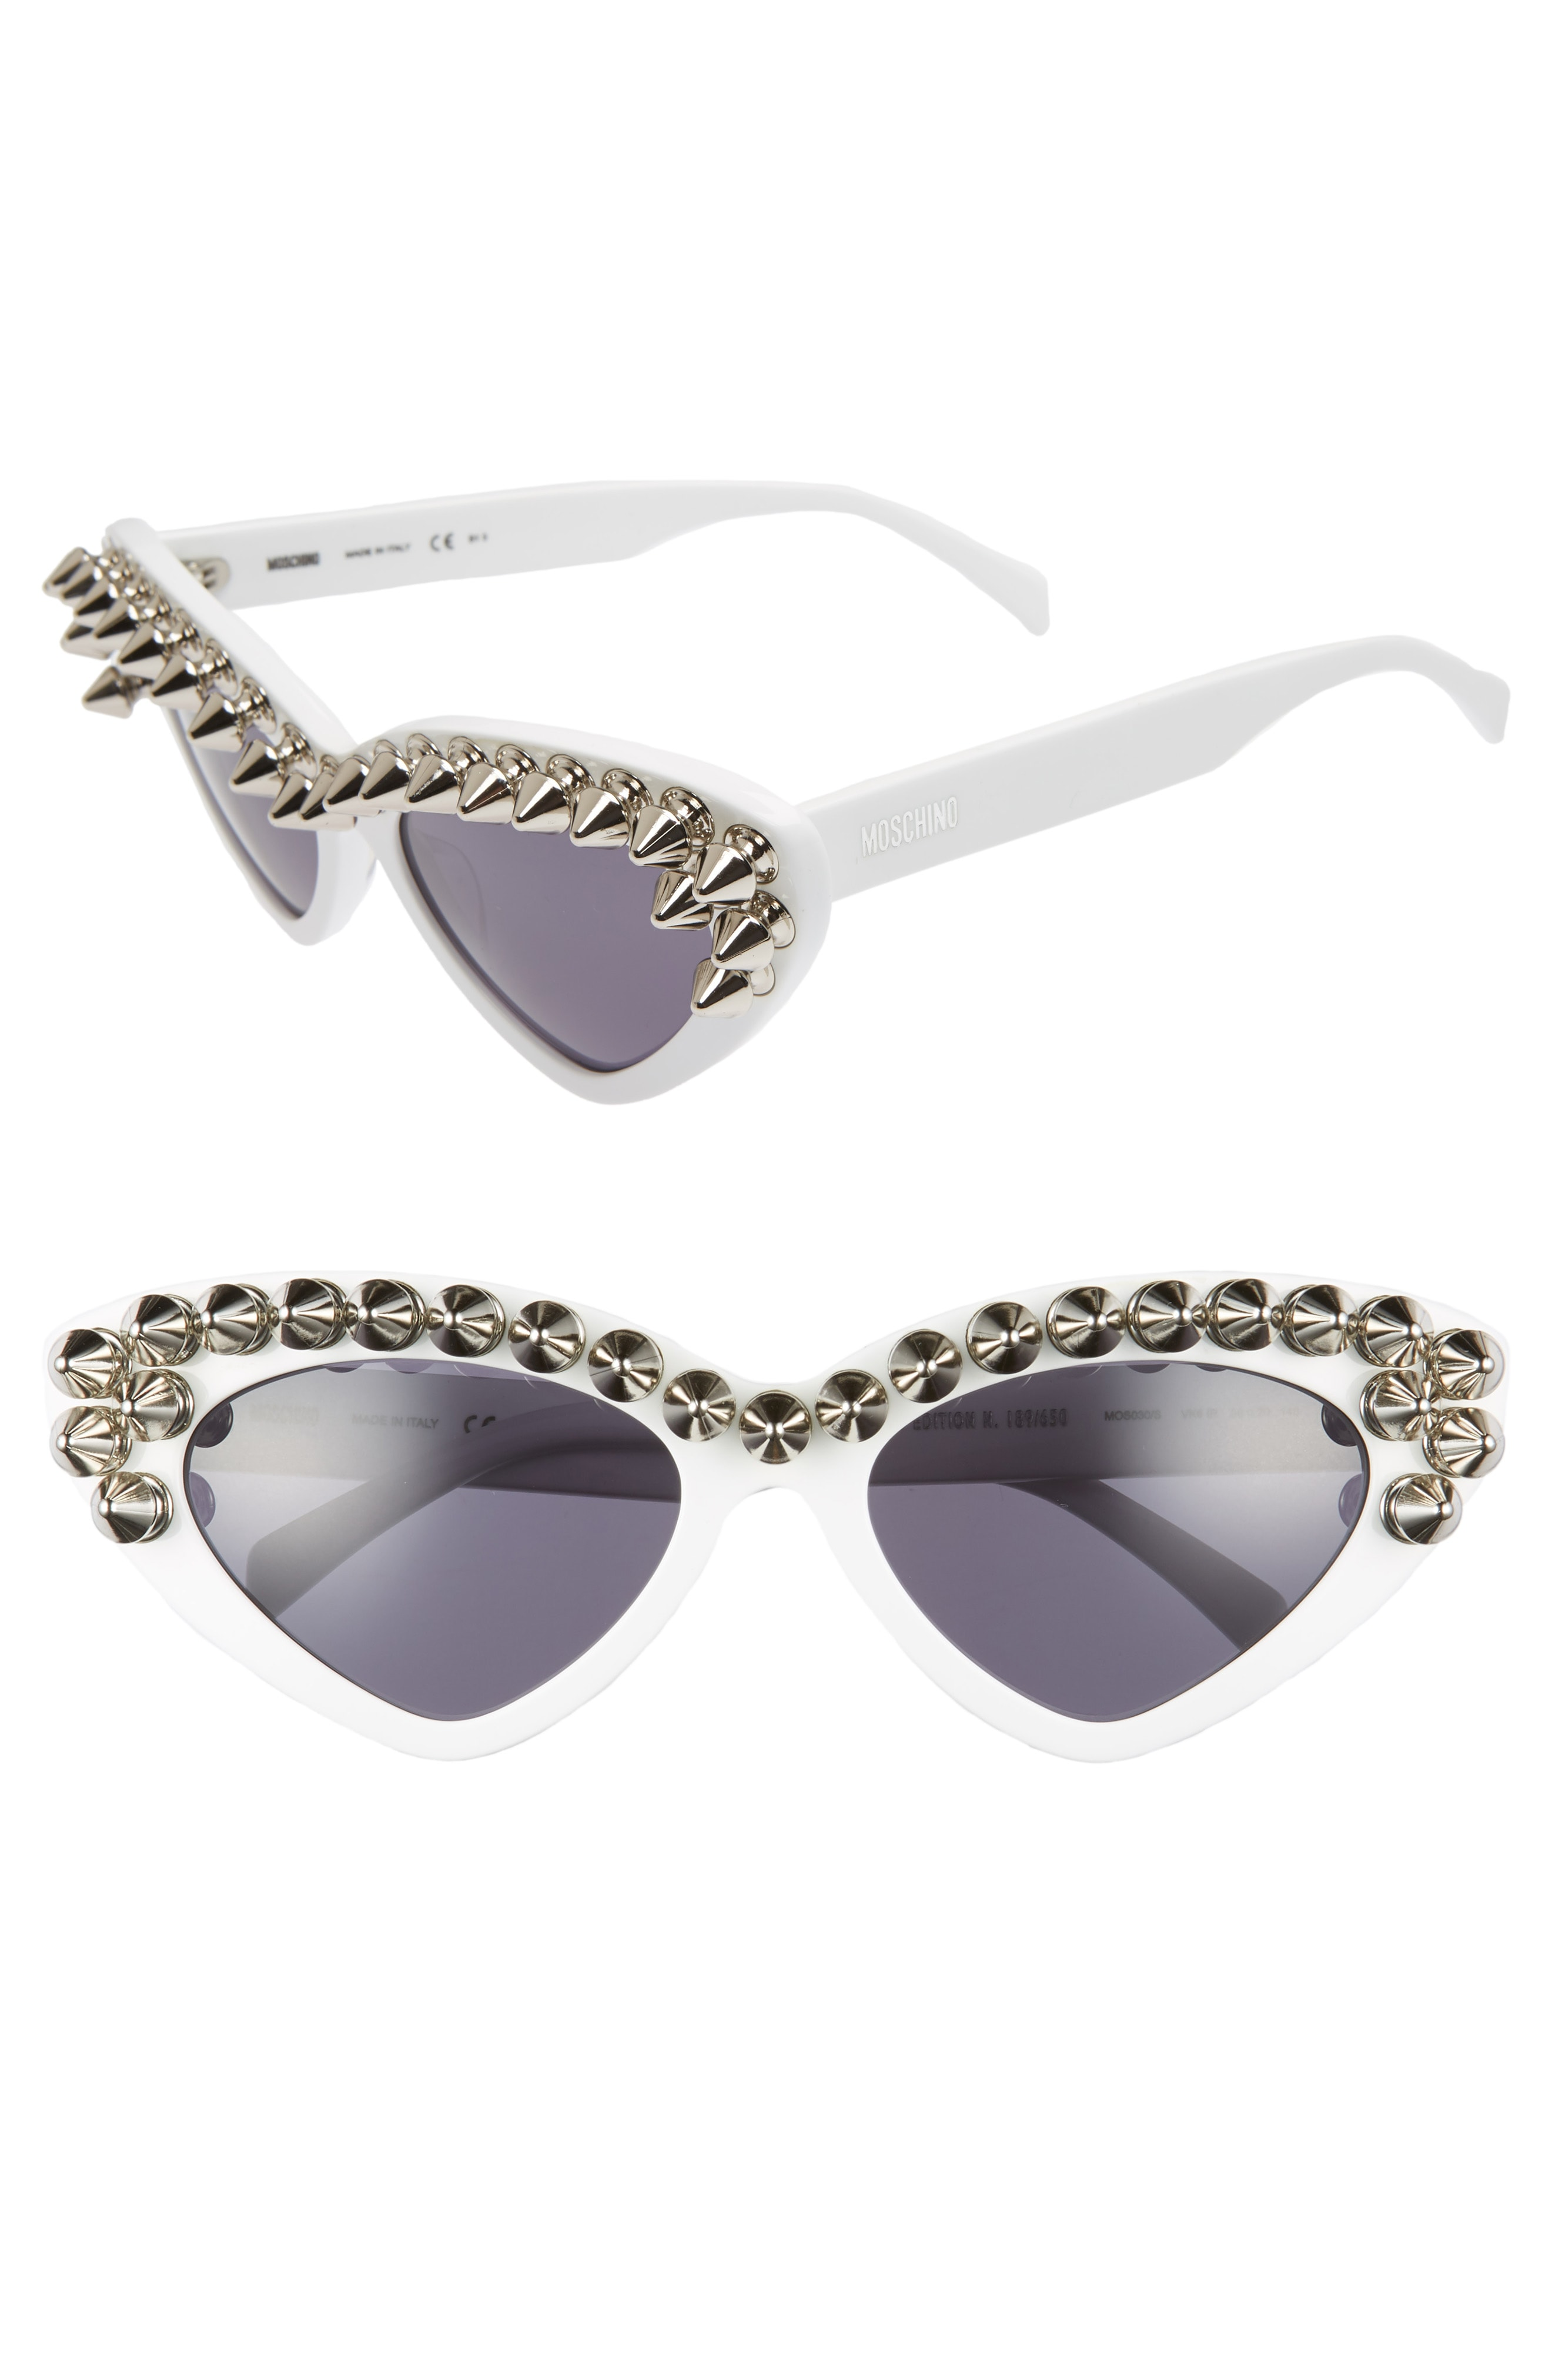 Moschino 59mm Studded Cat Eye Polarized Sunglasses